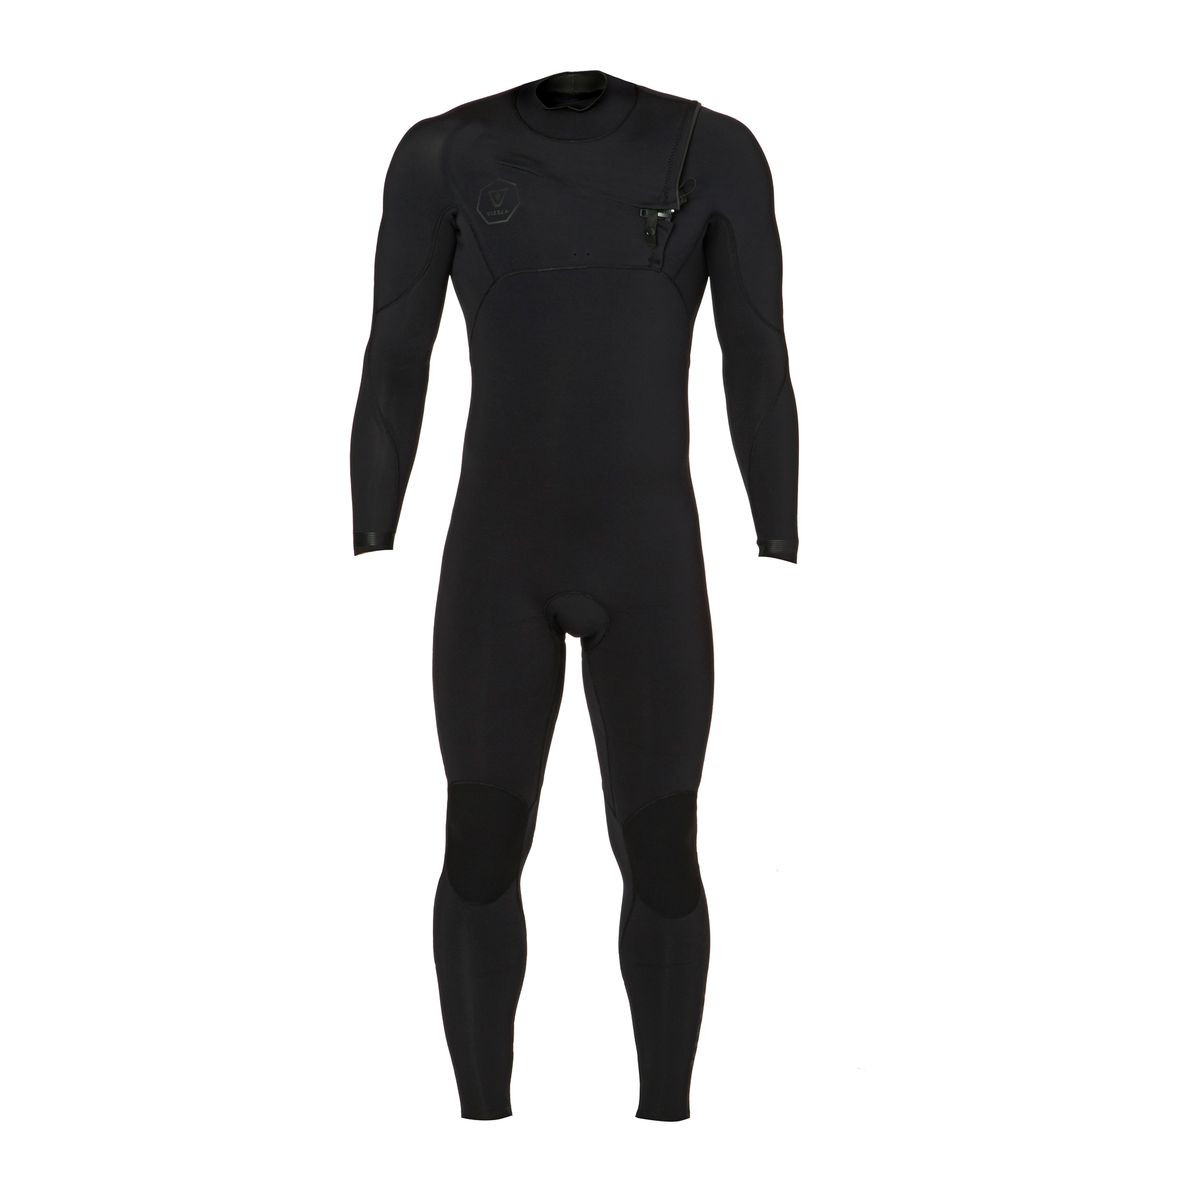 Vissla Seven Seas 3/2mm 2017 Chest Zip Wetsuit - Stealth